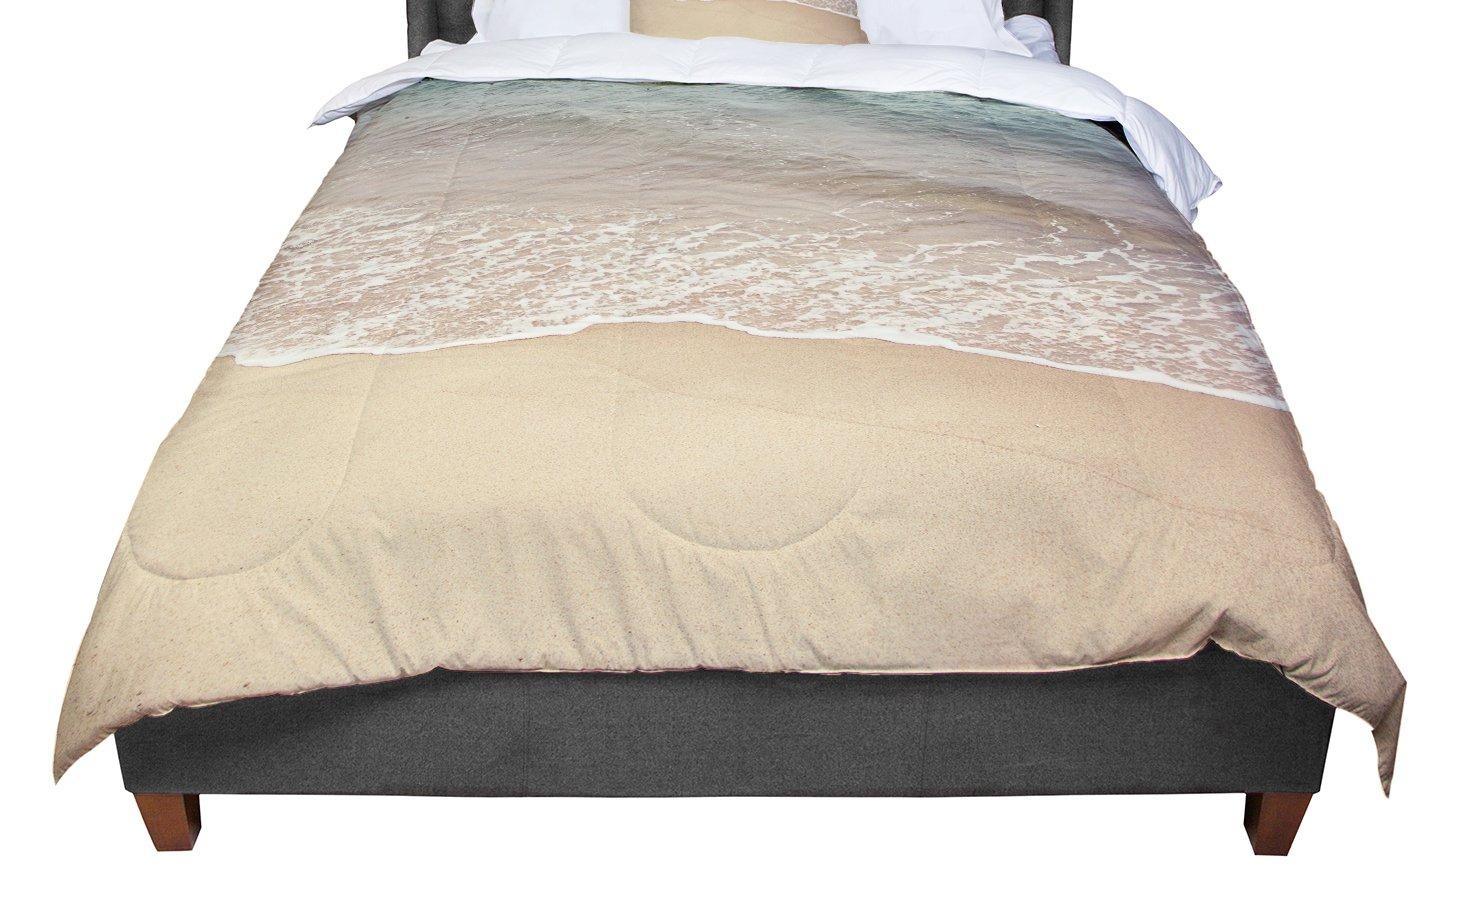 68 X 88 KESS InHouse Jillian Audrey Waves Roll In Brown Teal Twin Comforter